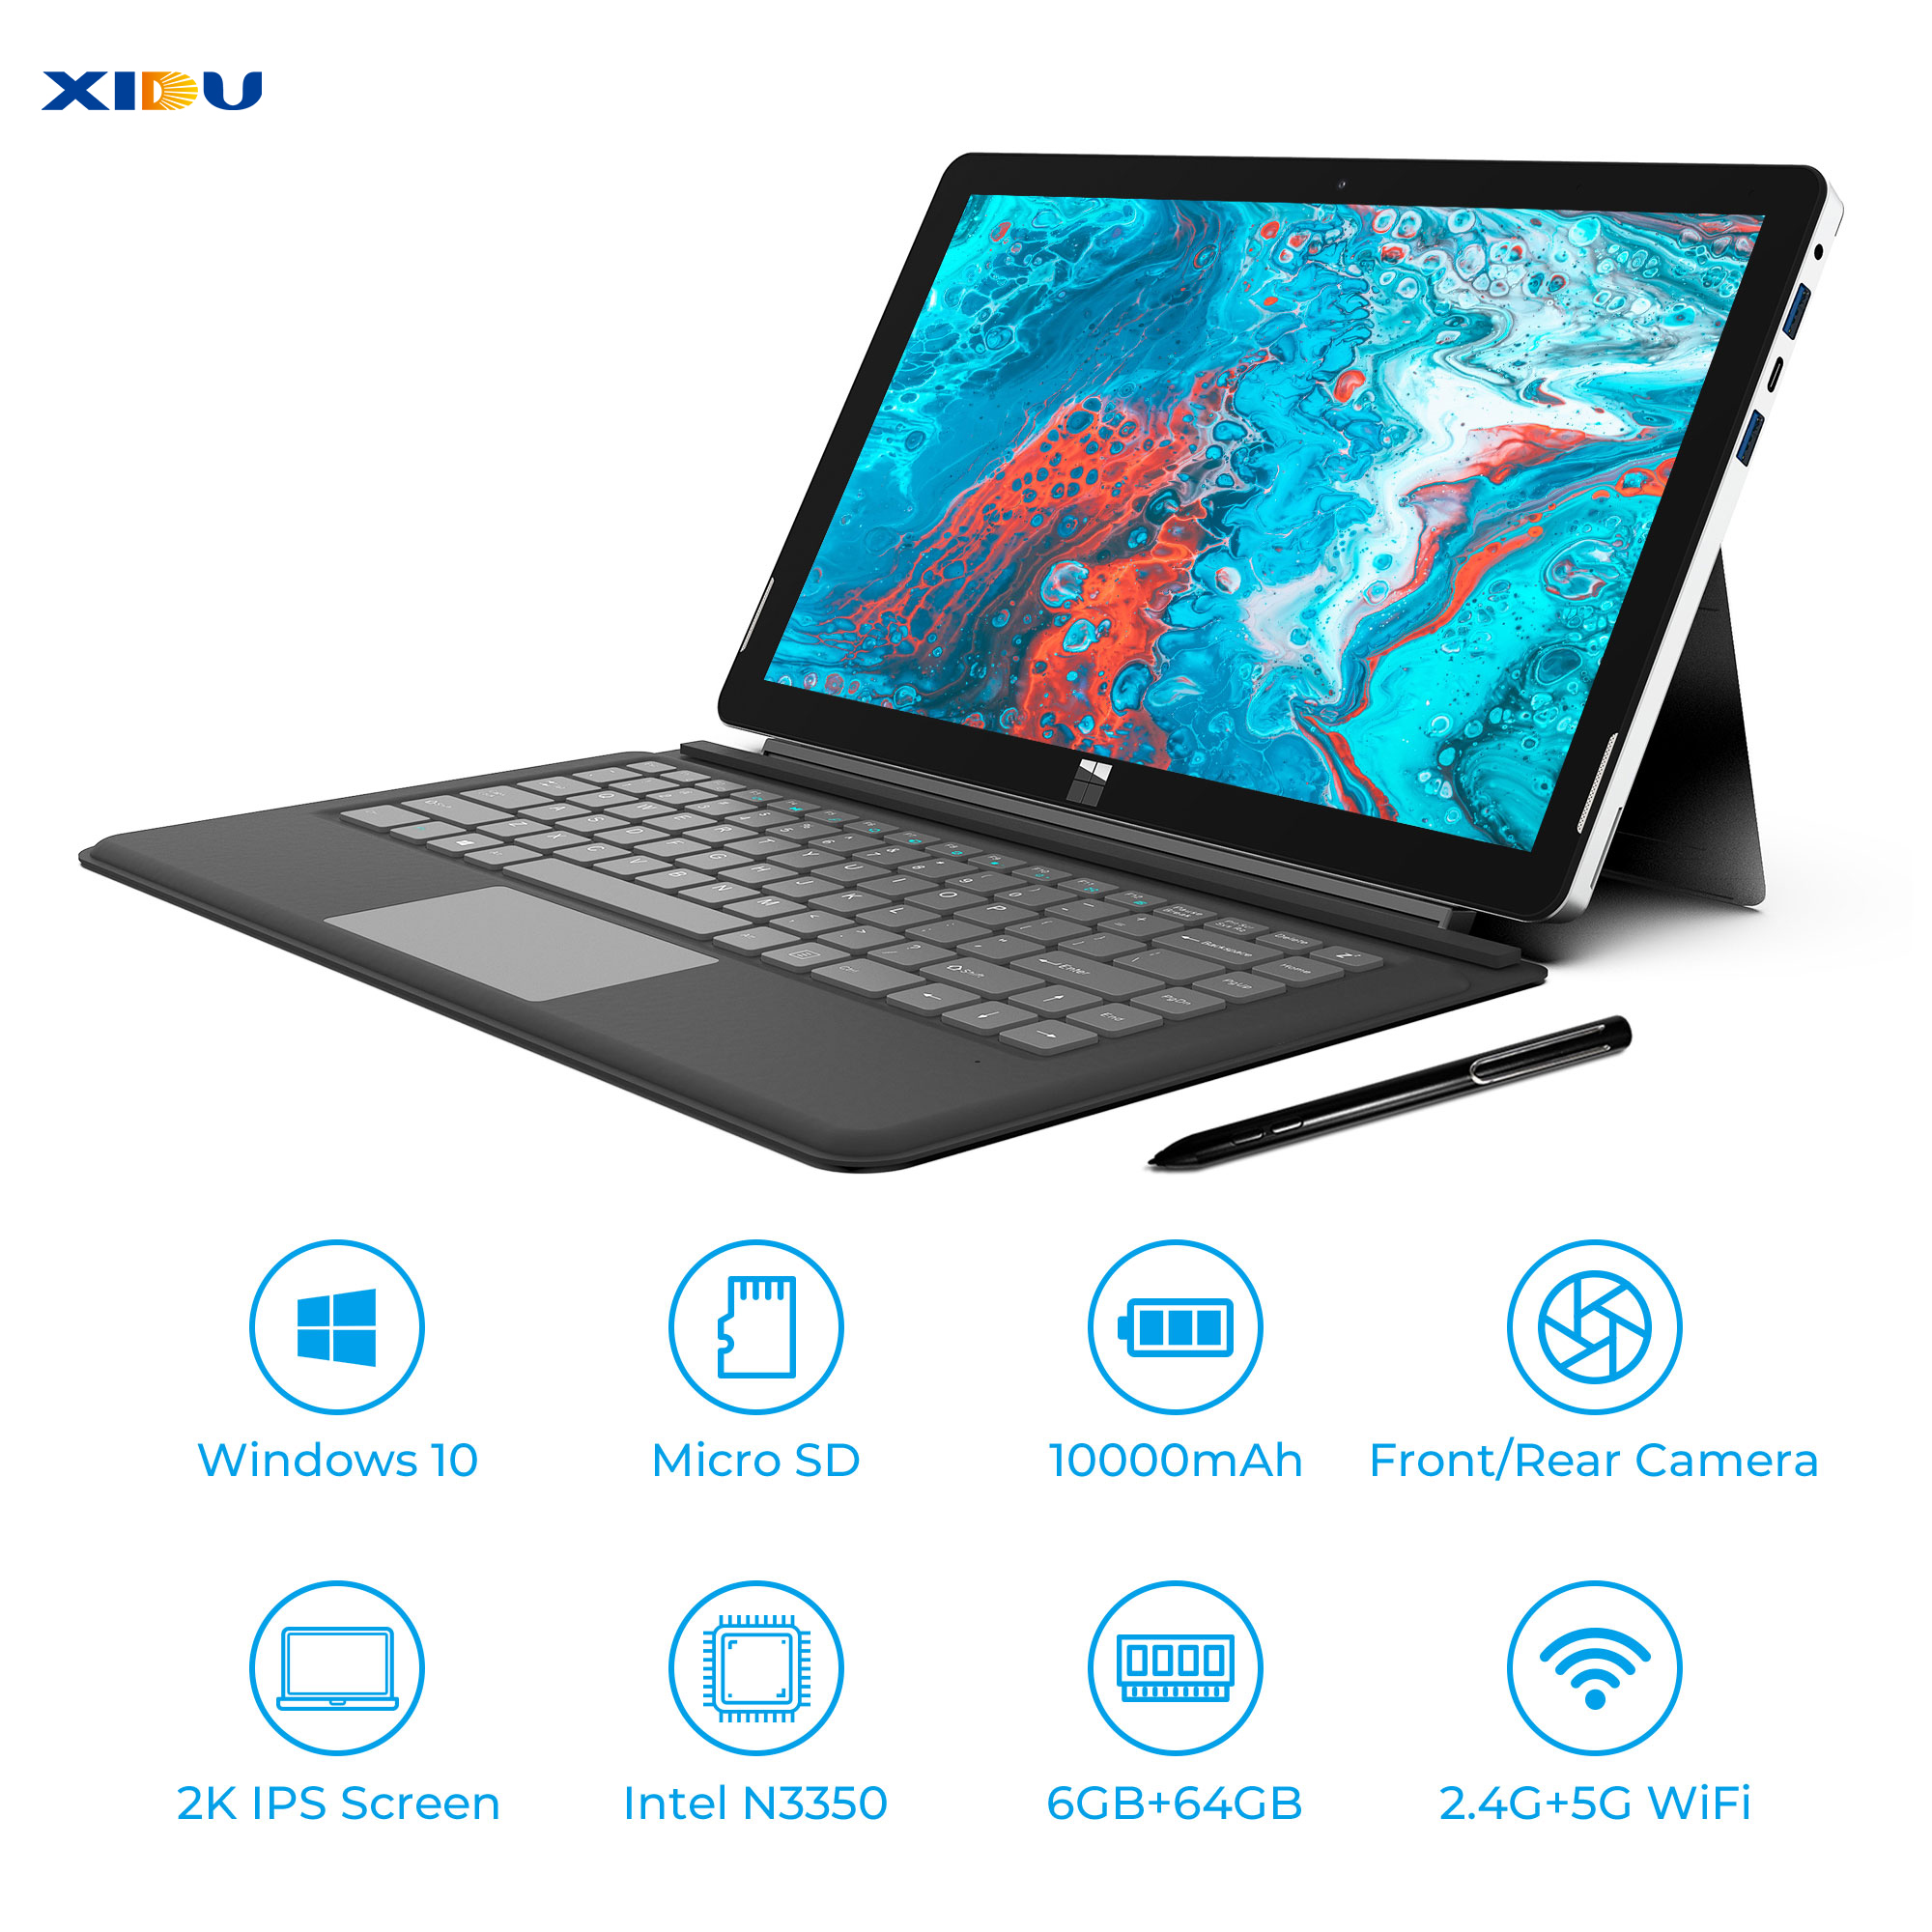 XIDU PhilPad Dual Core Windows 10 Tablets 6GB RAM 64GB ROM 13.3 N3350 Laptop 2560x1440 Display Dual WIFI with Tablet PenXIDU PhilPad Dual Core Windows 10 Tablets 6GB RAM 64GB ROM 13.3 N3350 Laptop 2560x1440 Display Dual WIFI with Tablet Pen